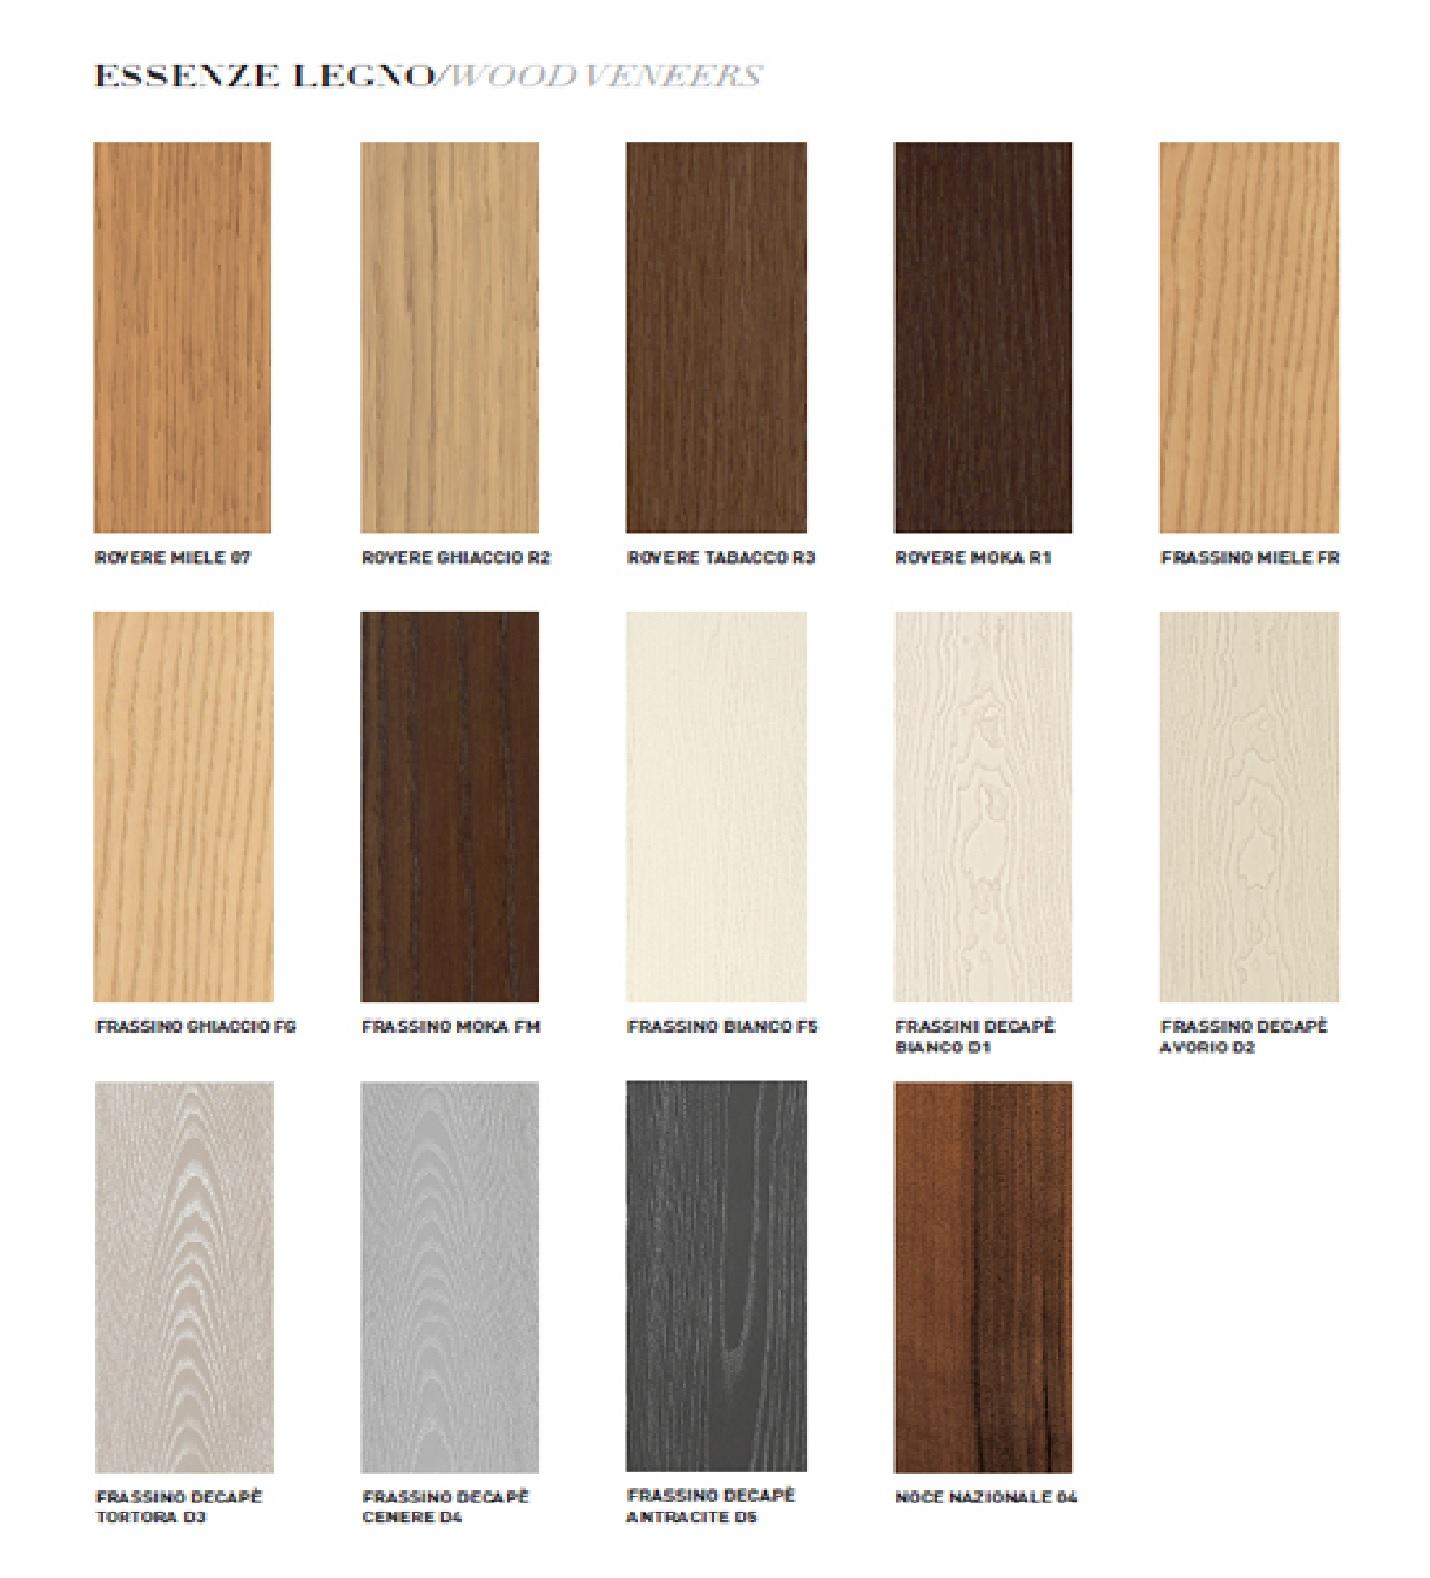 Porte interne varie essenza e laccate infix - Colori da interno ...